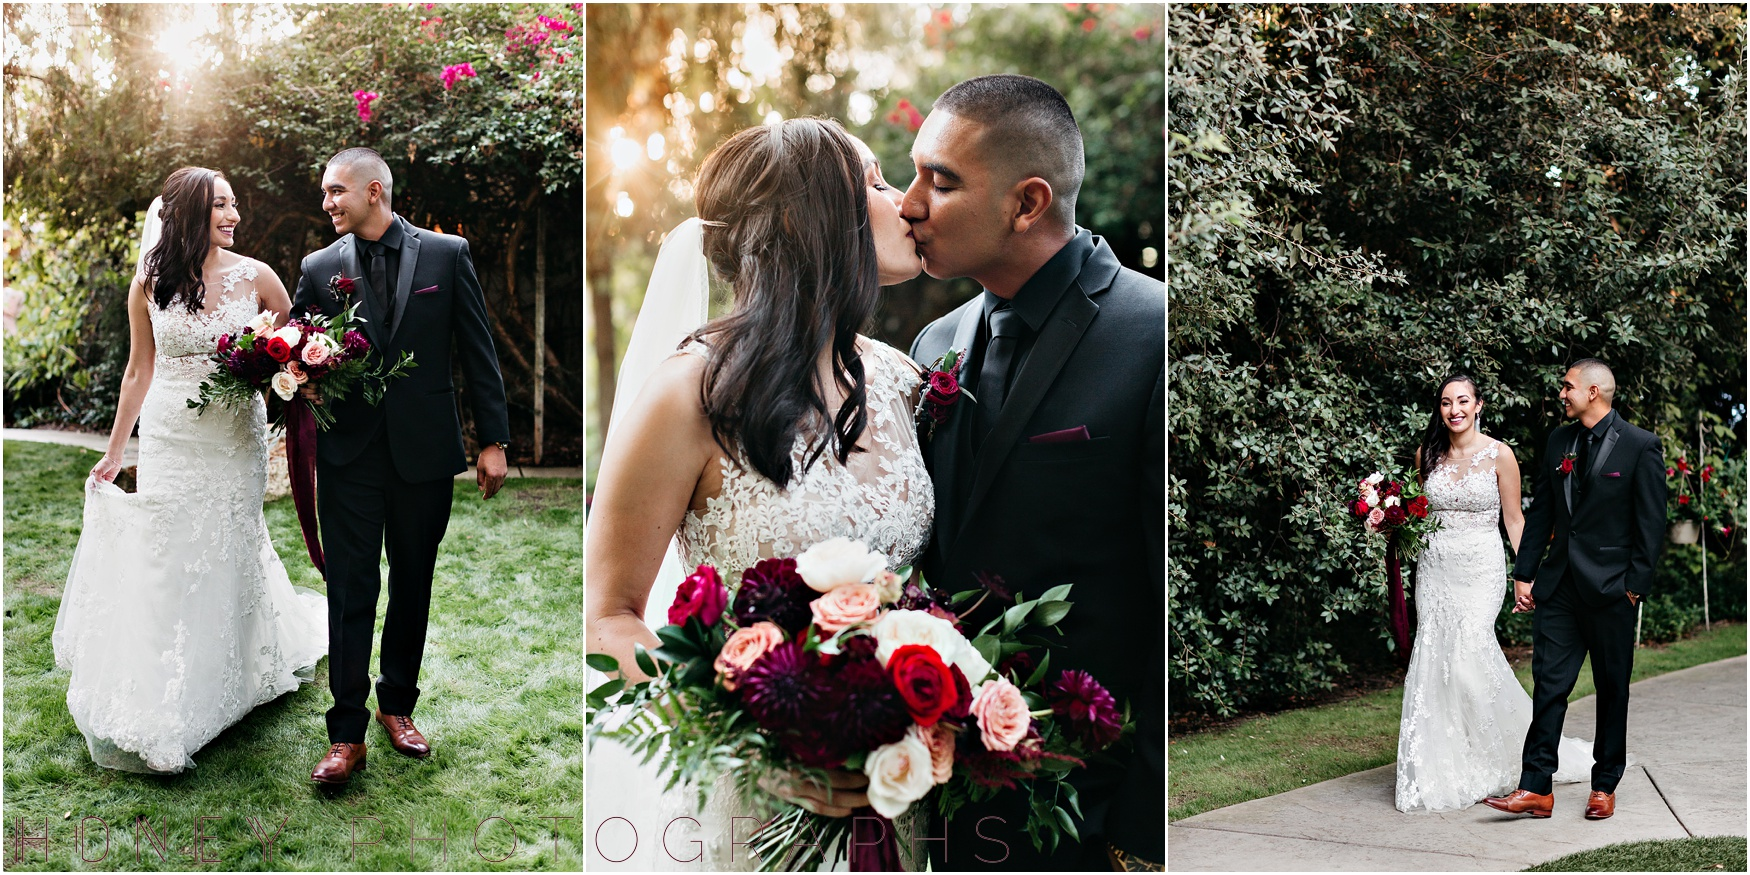 twin_oaks_garden_estate_fall_winter_burgundy_wedding034.jpg